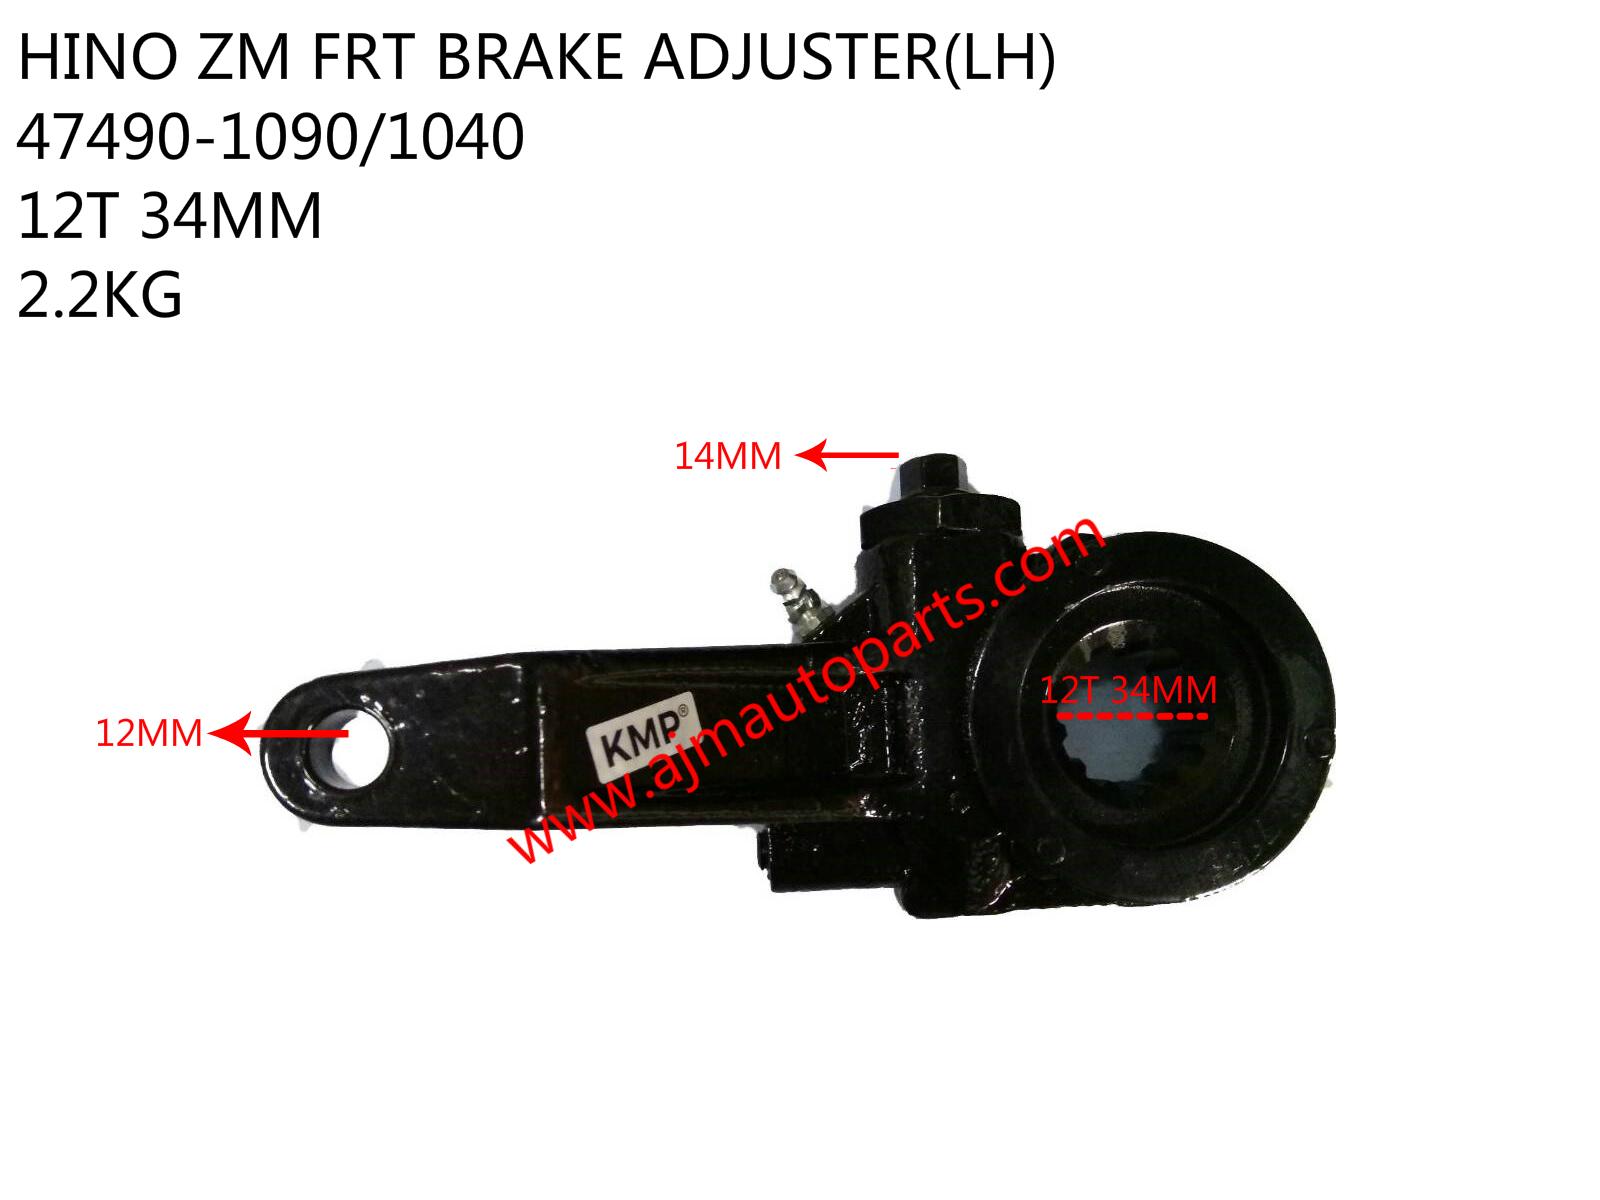 HINO-ZM-FRT-BRAKE-ADJUSTER-47490-1090